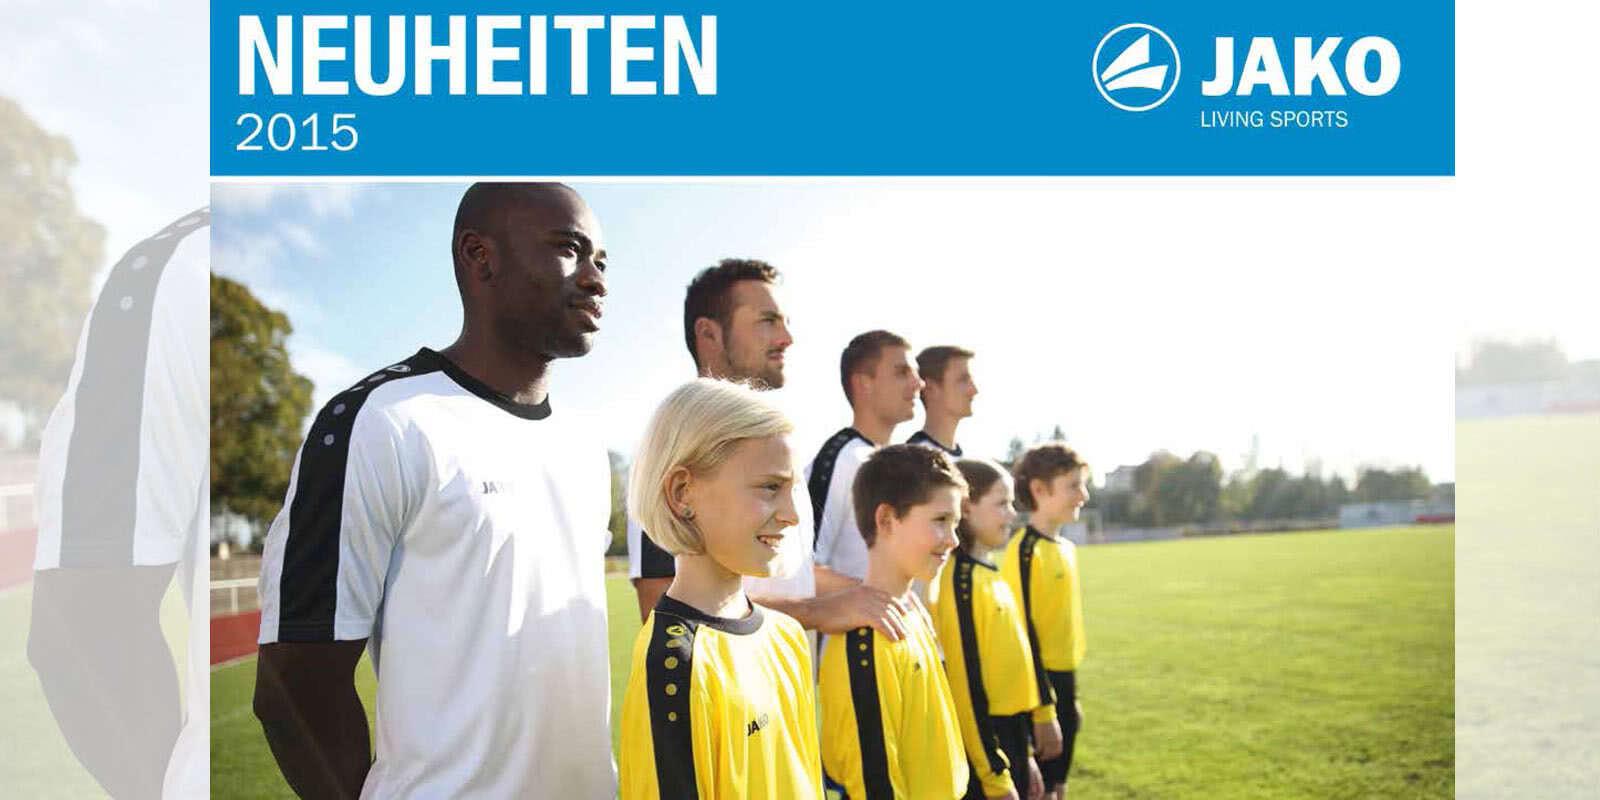 942a2e8708f346 Jako Neuheiten 2015 2016 - Teamline - Trikots - uvm - Sportartikel ...